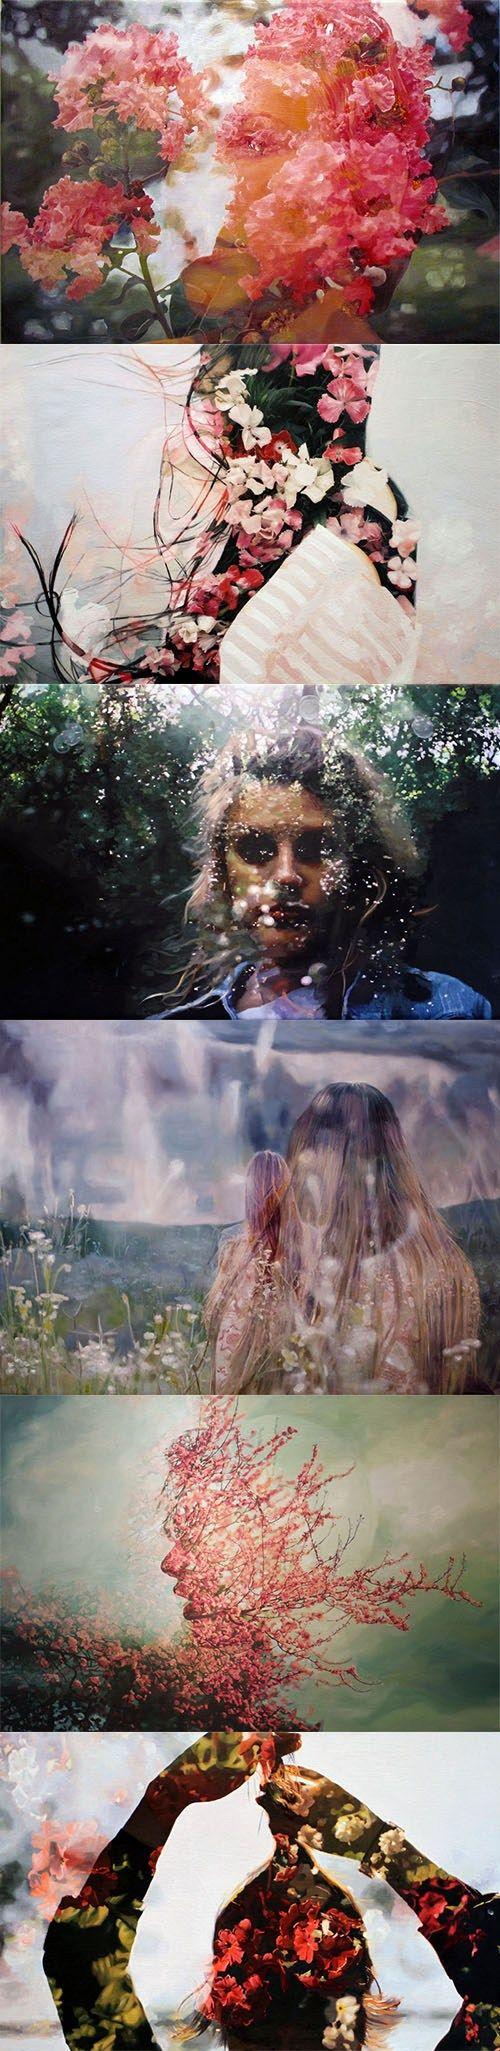 Pakayla Rae Biehn's double exposure oil series